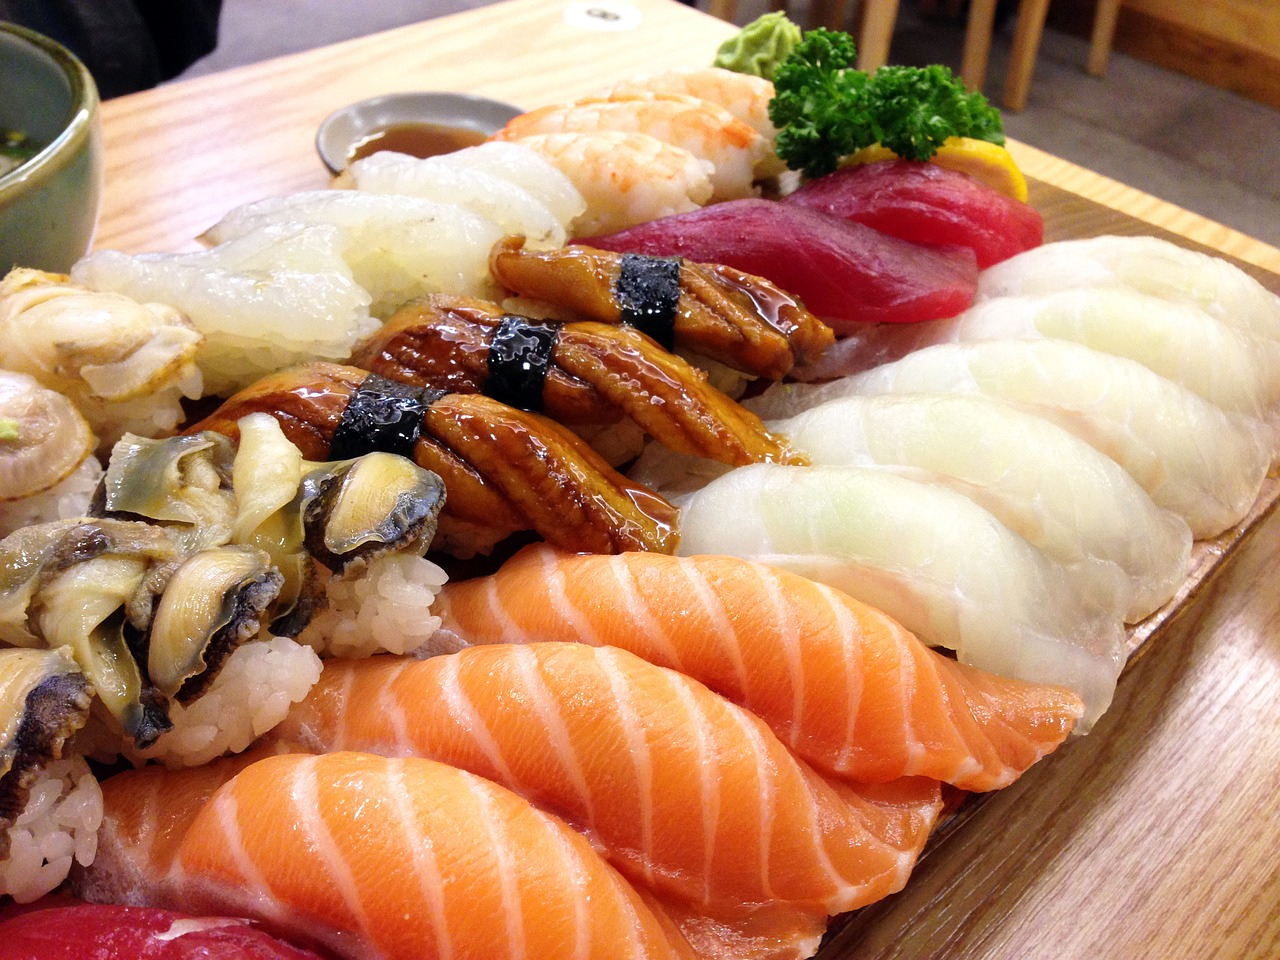 Asiatische Lebensmittel